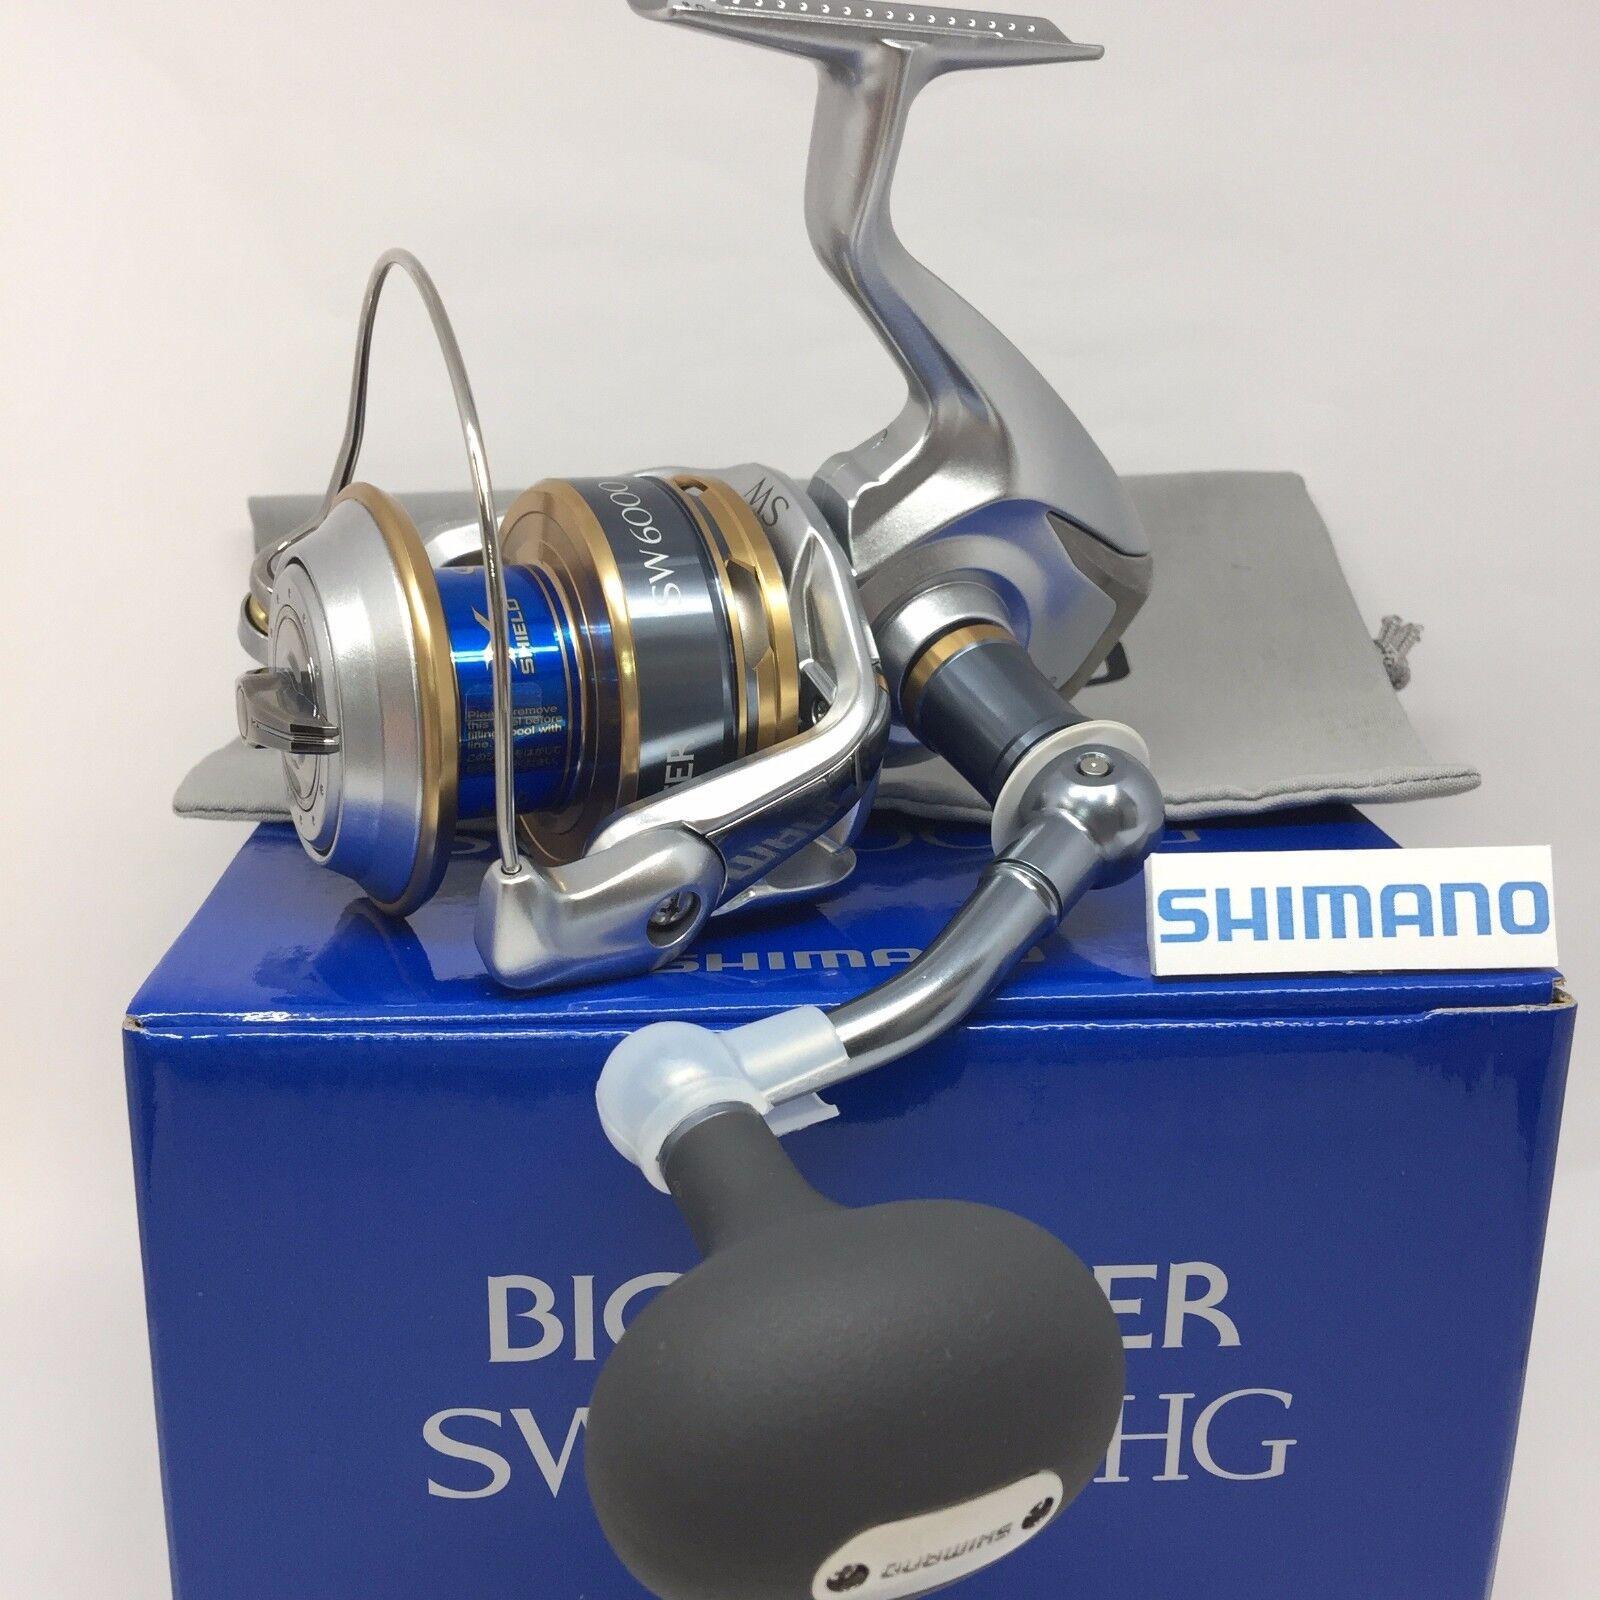 SHIMANO 16 BIOMASTER SW 6000HG   - Free Free - Shipping from Japan 1b7eb3